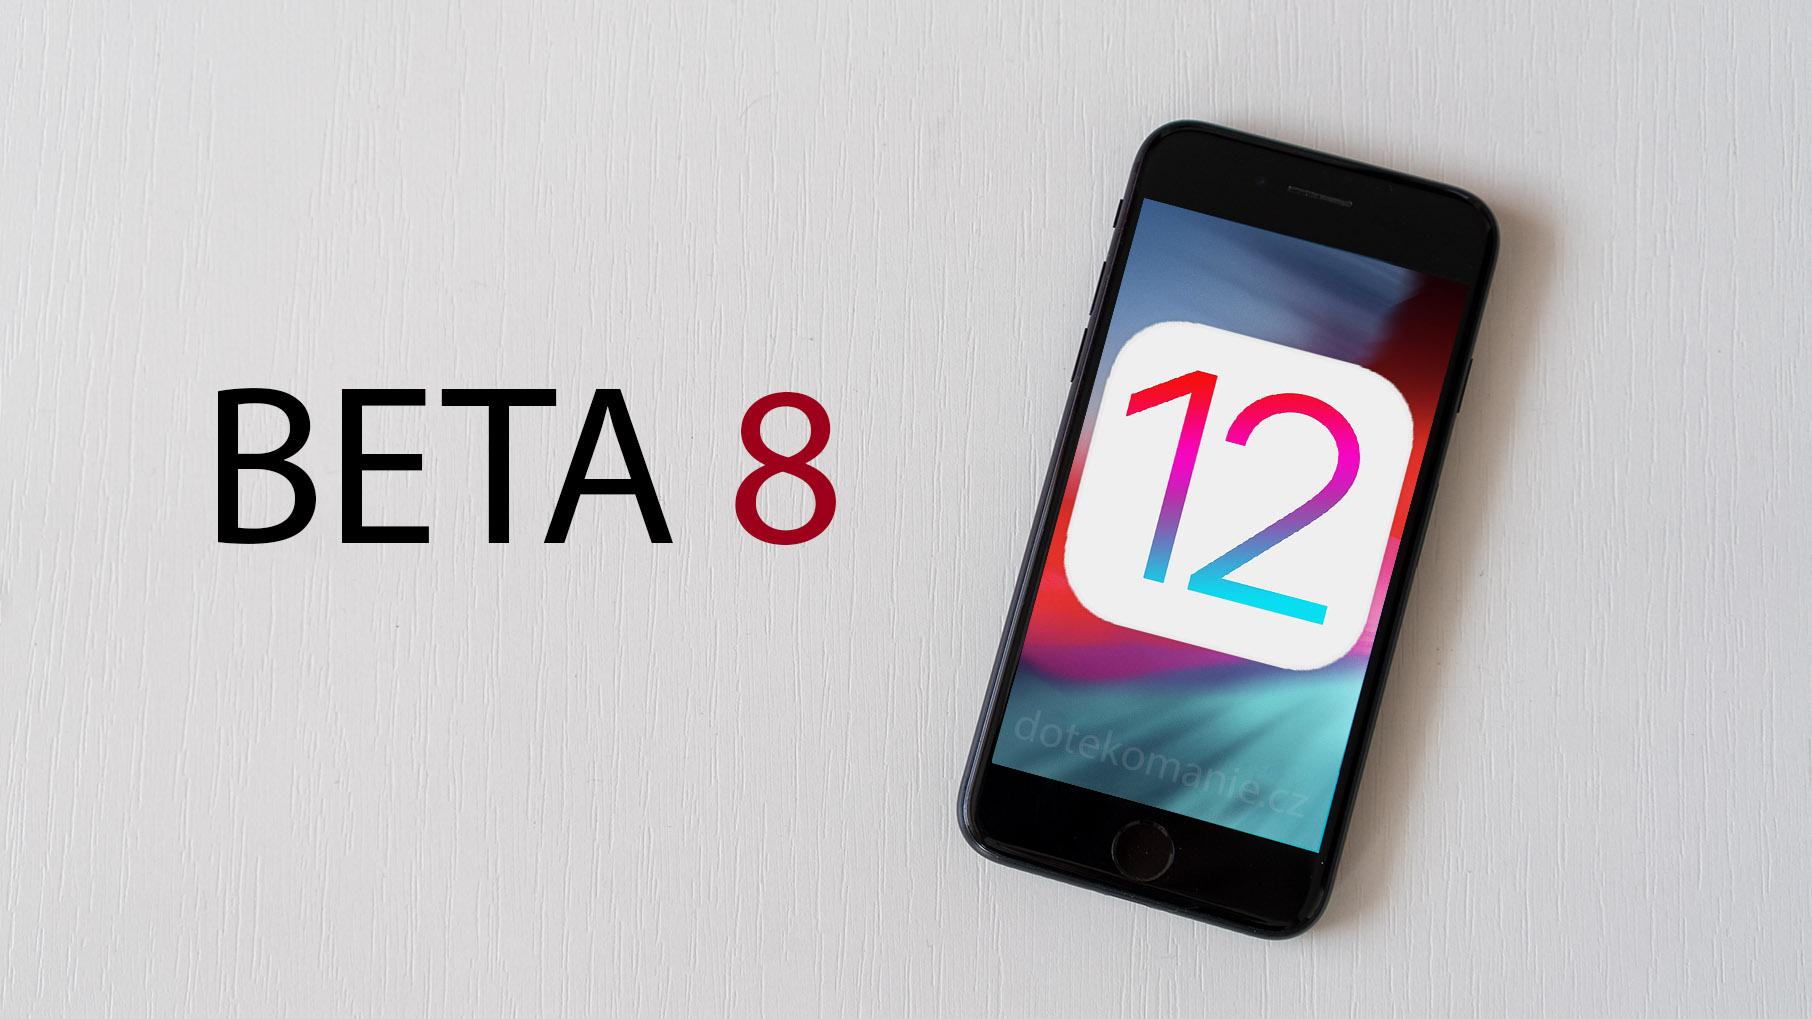 Apple vydal iOS 12 beta 8, odstranil skupinové hovory a přidal drobné funkce